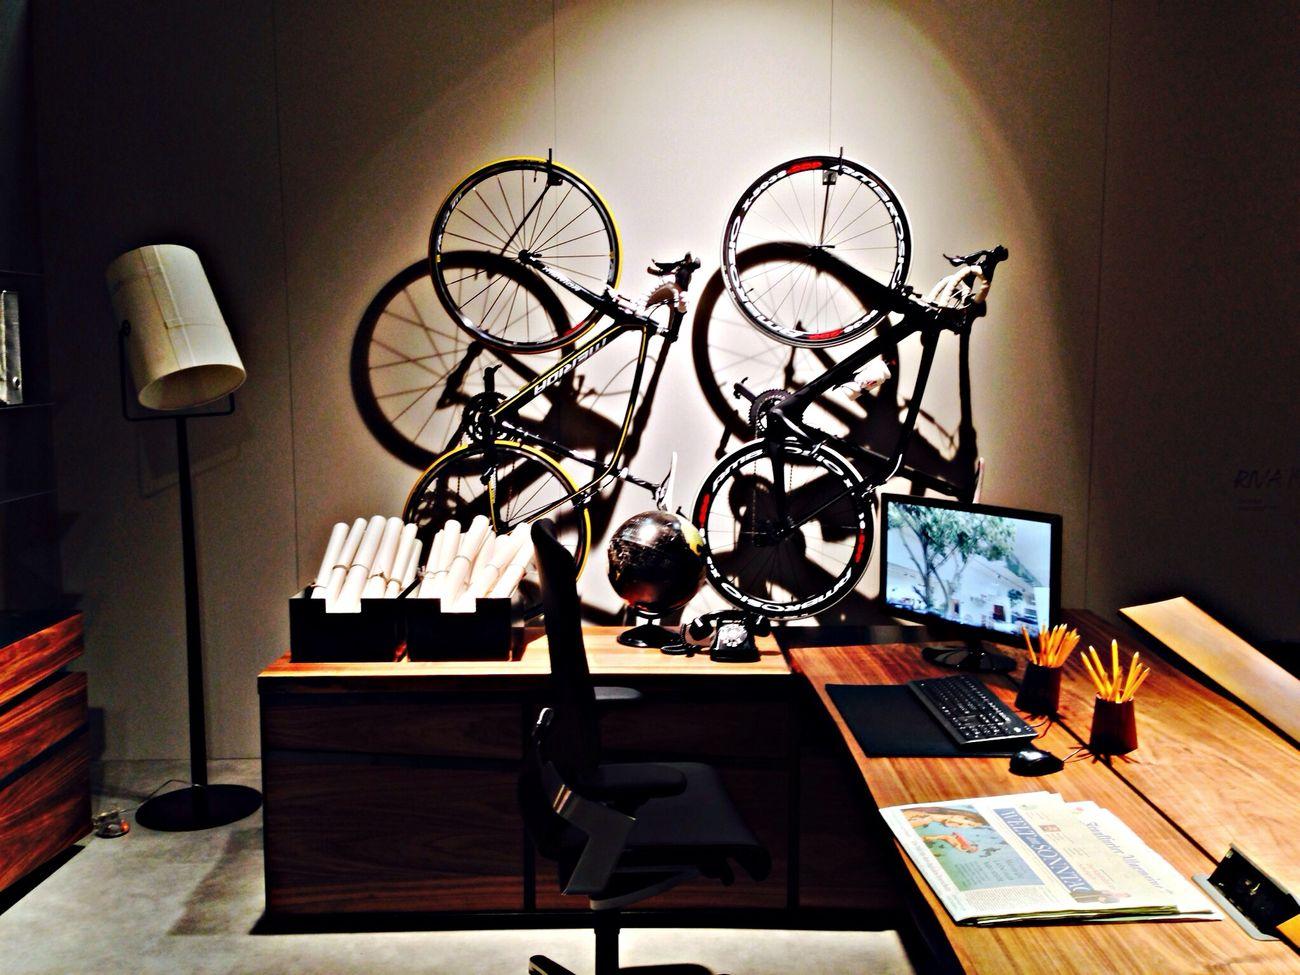 Put your bike